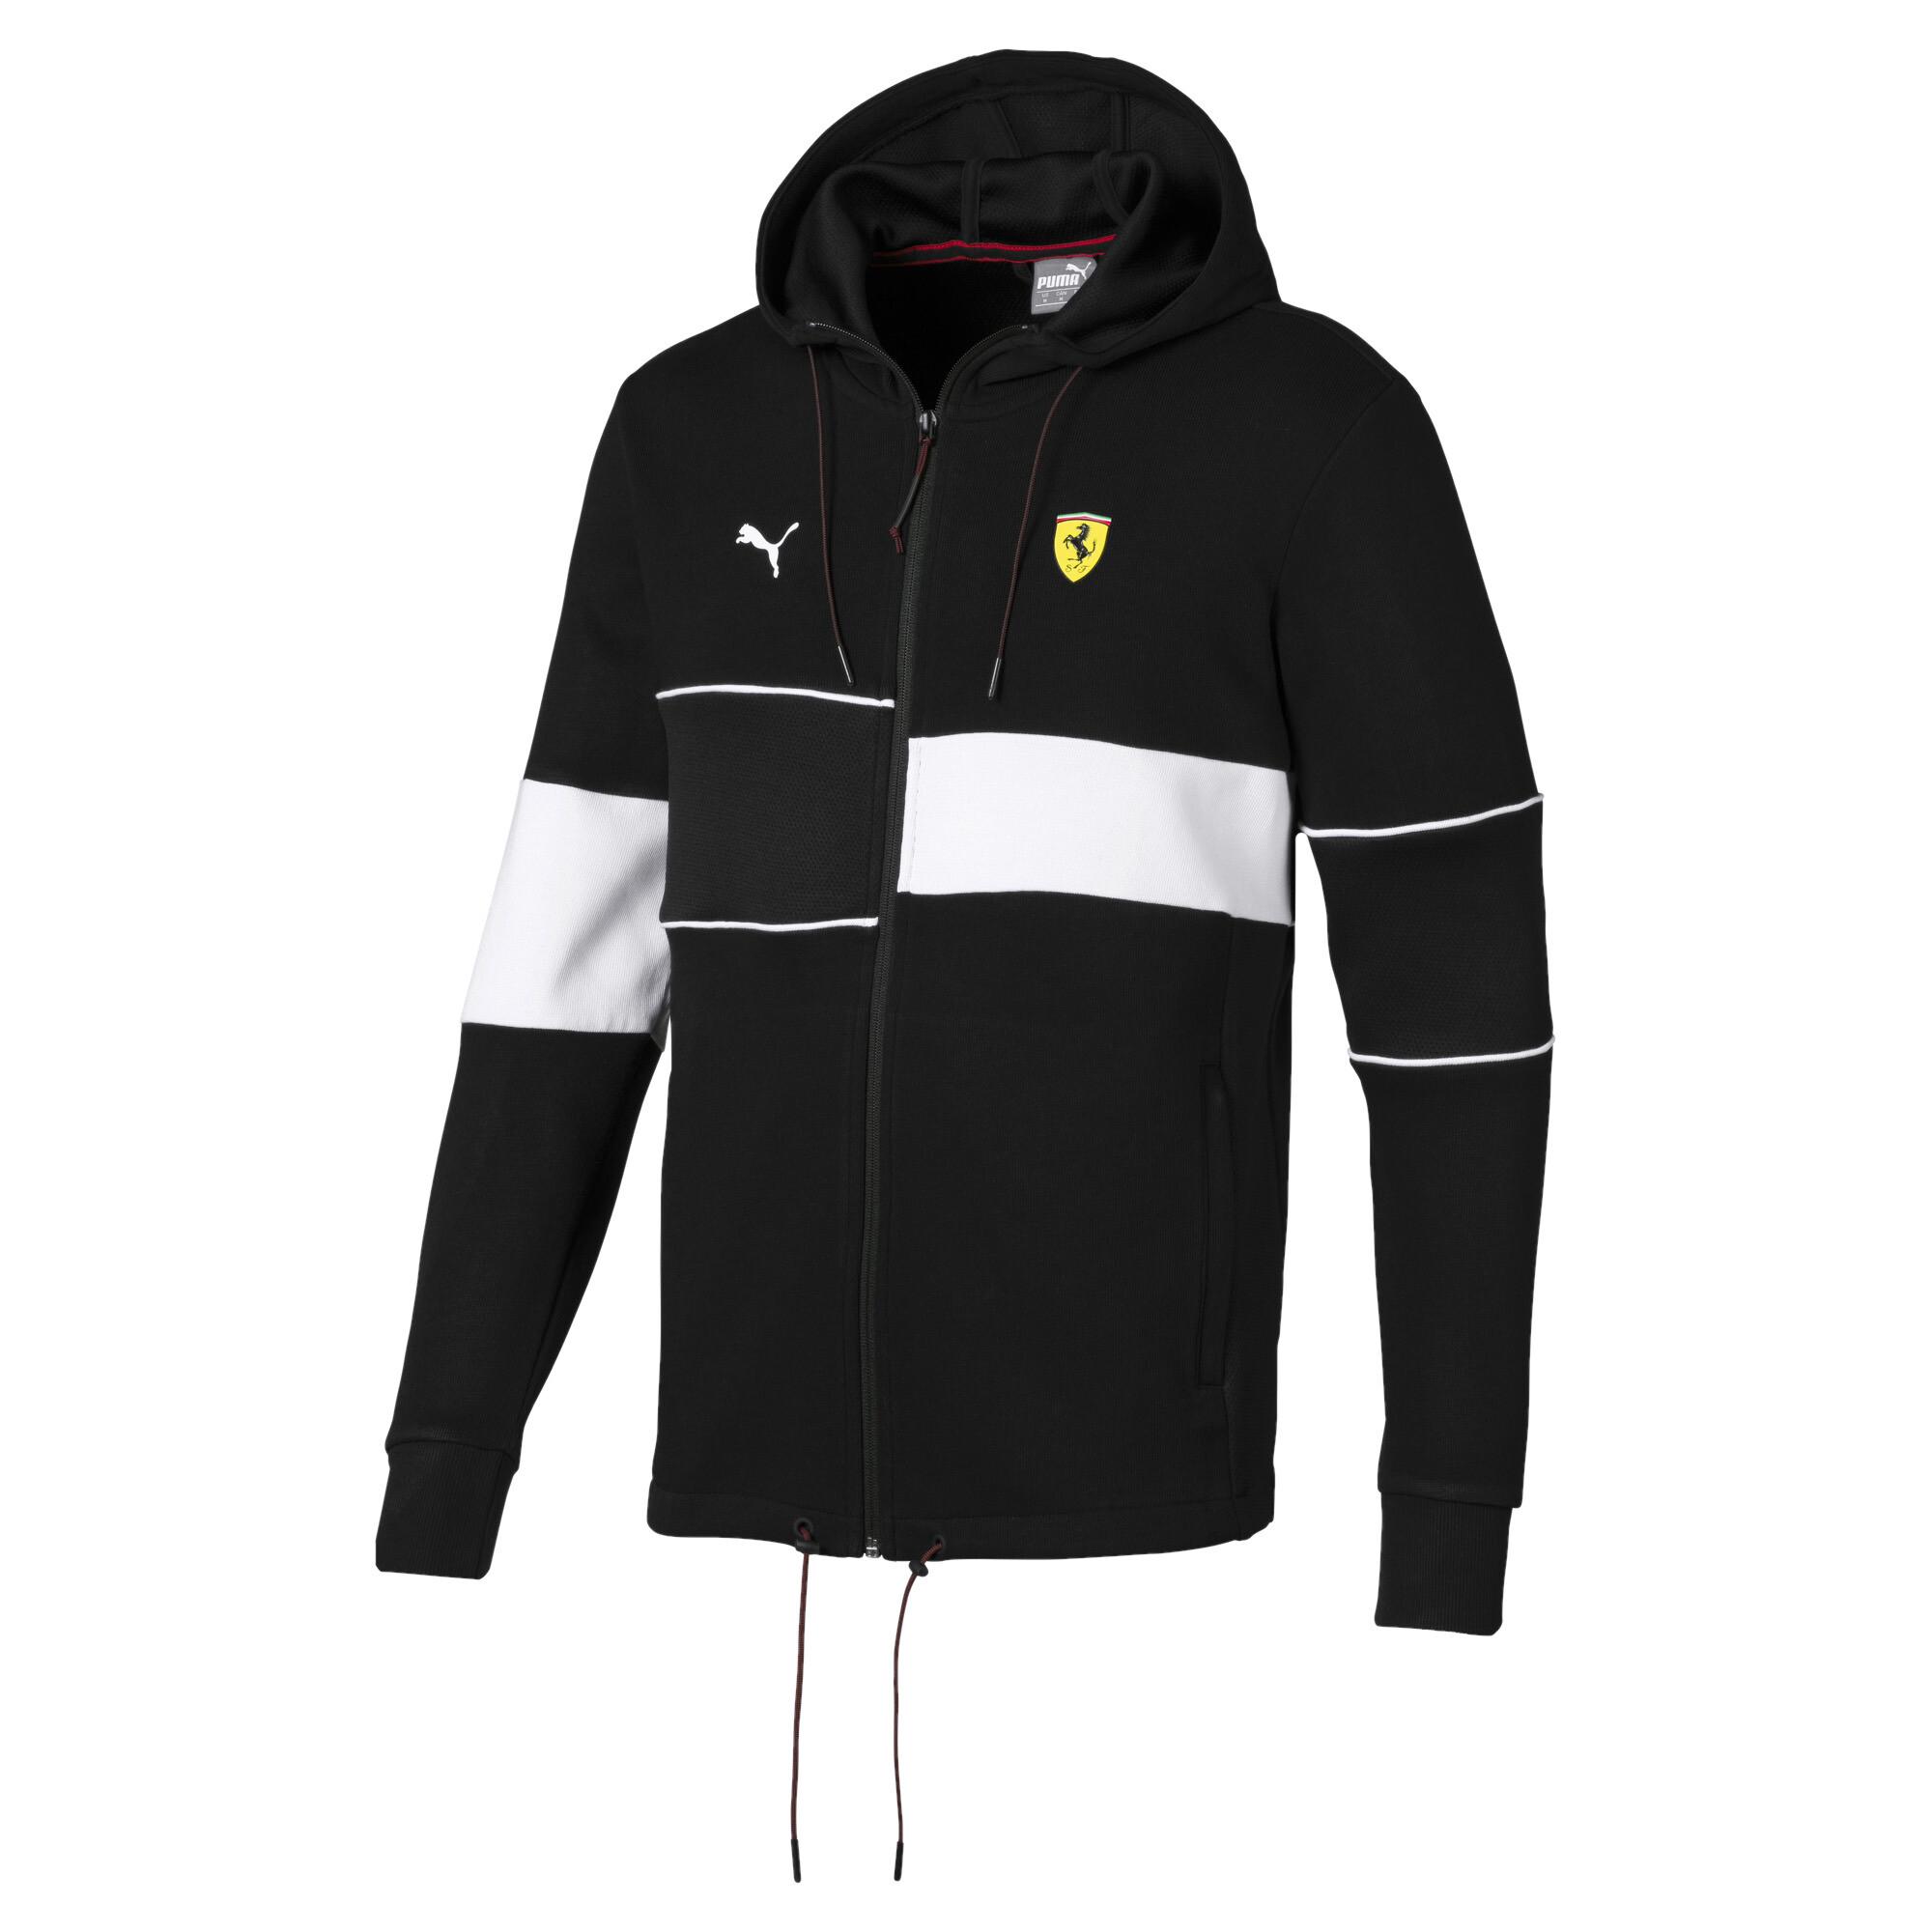 265505b1e Jackets & Outerwear - Clothing - Mens